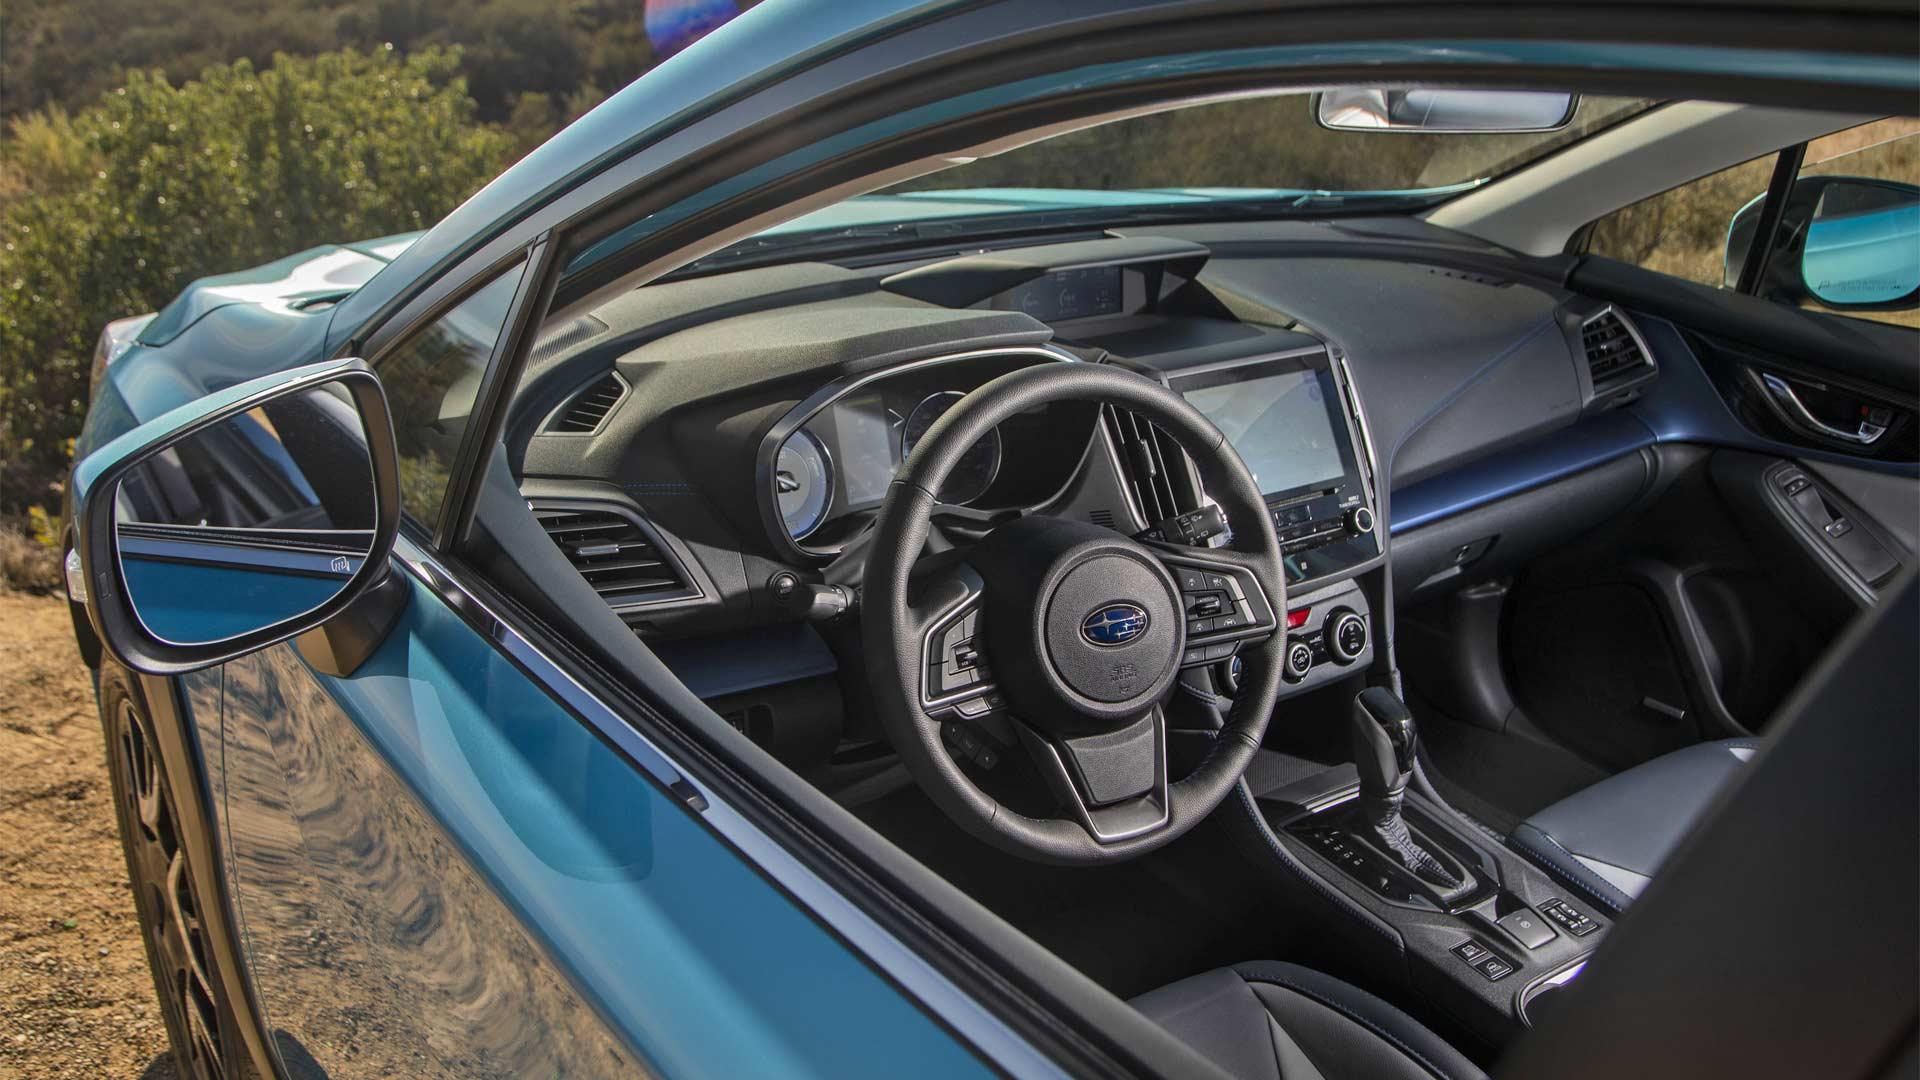 2019-Subaru-Crosstrek-Hybrid-Interior